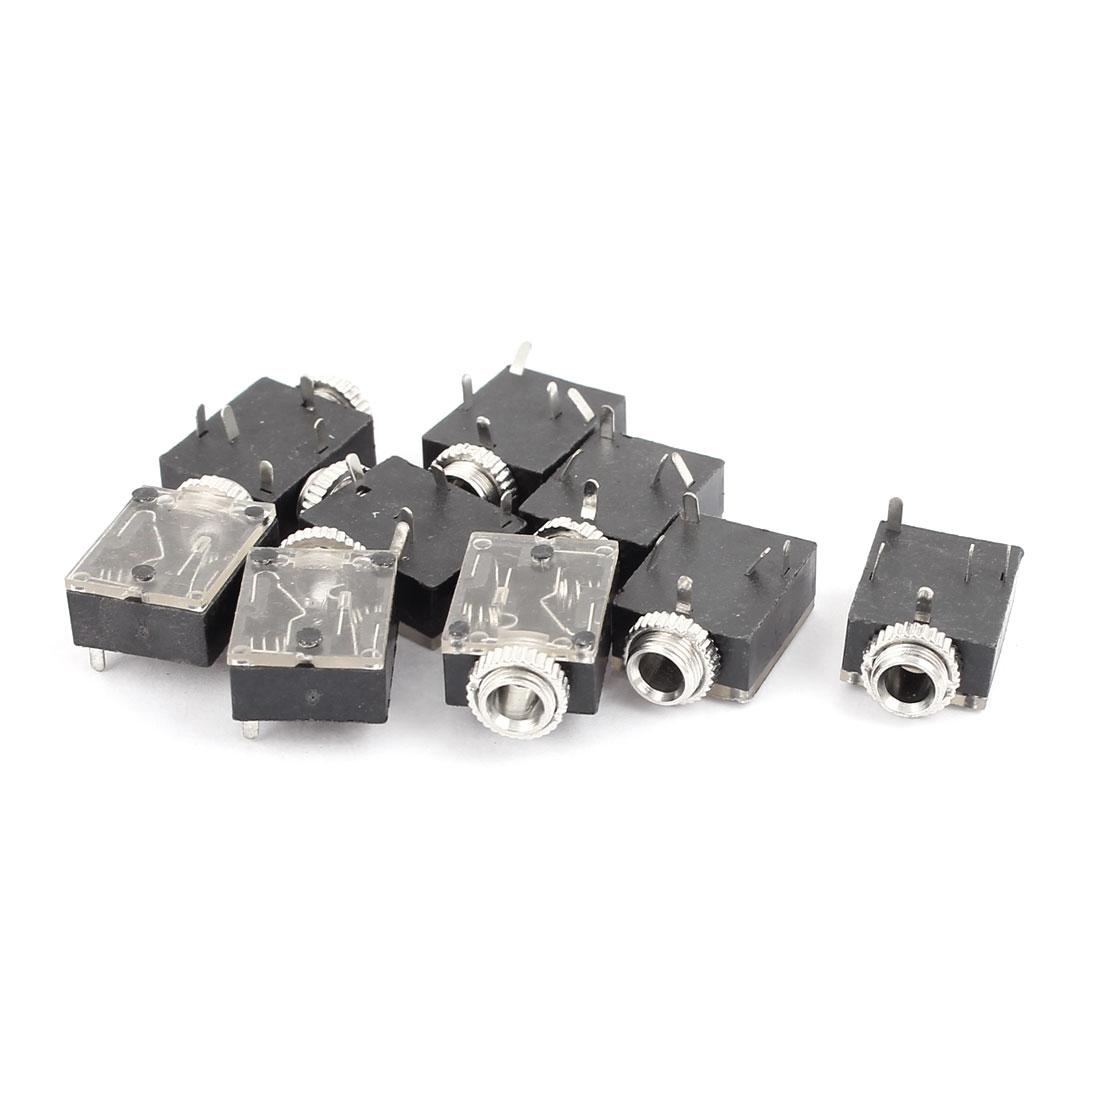 9 Pcs Plastic PCB Panel Mount 5 Terminal Female 3.5mm Earphone Audio Jack Socket